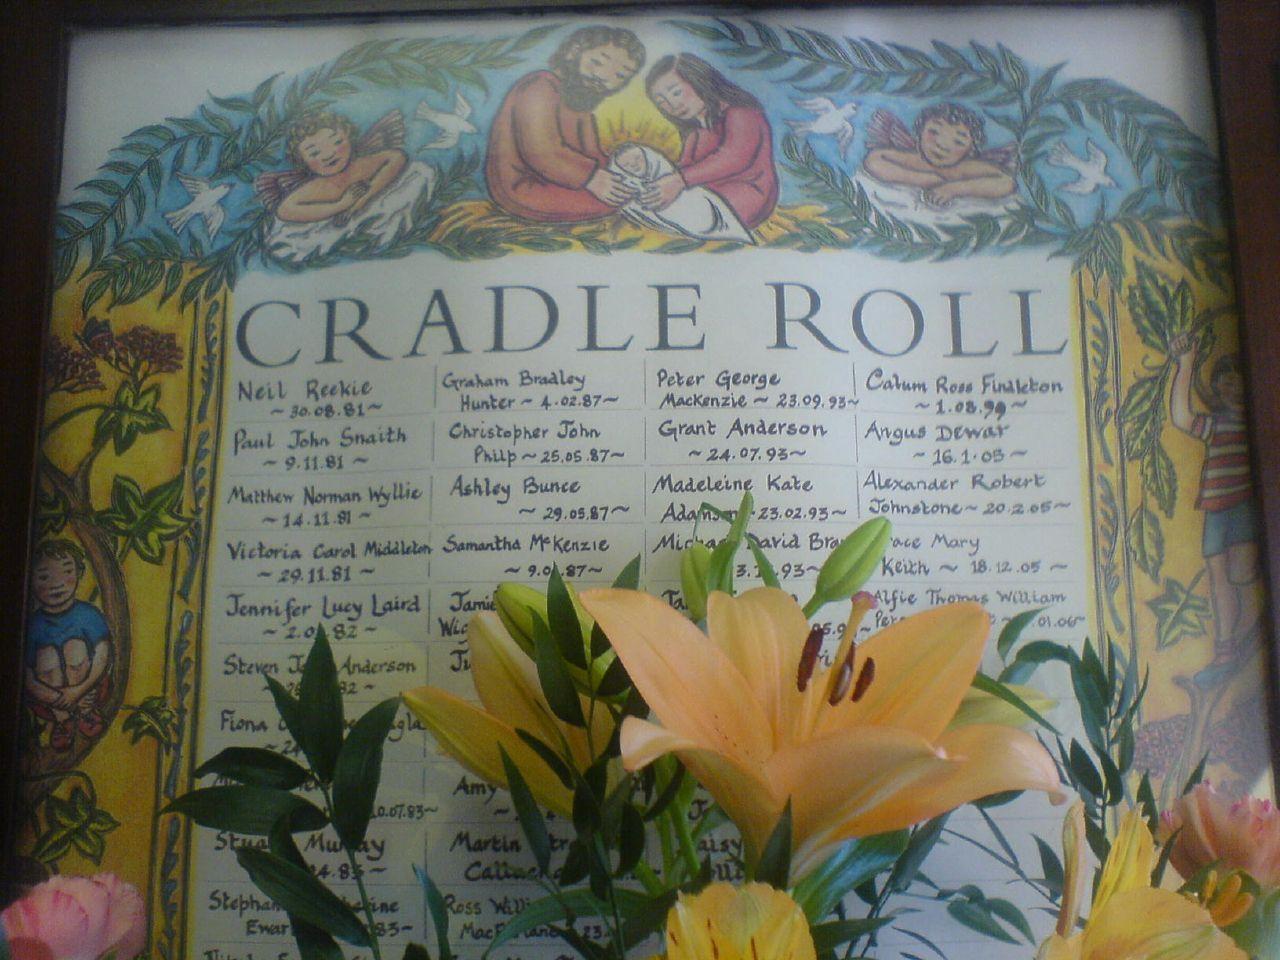 cradle-roll_443429394_o